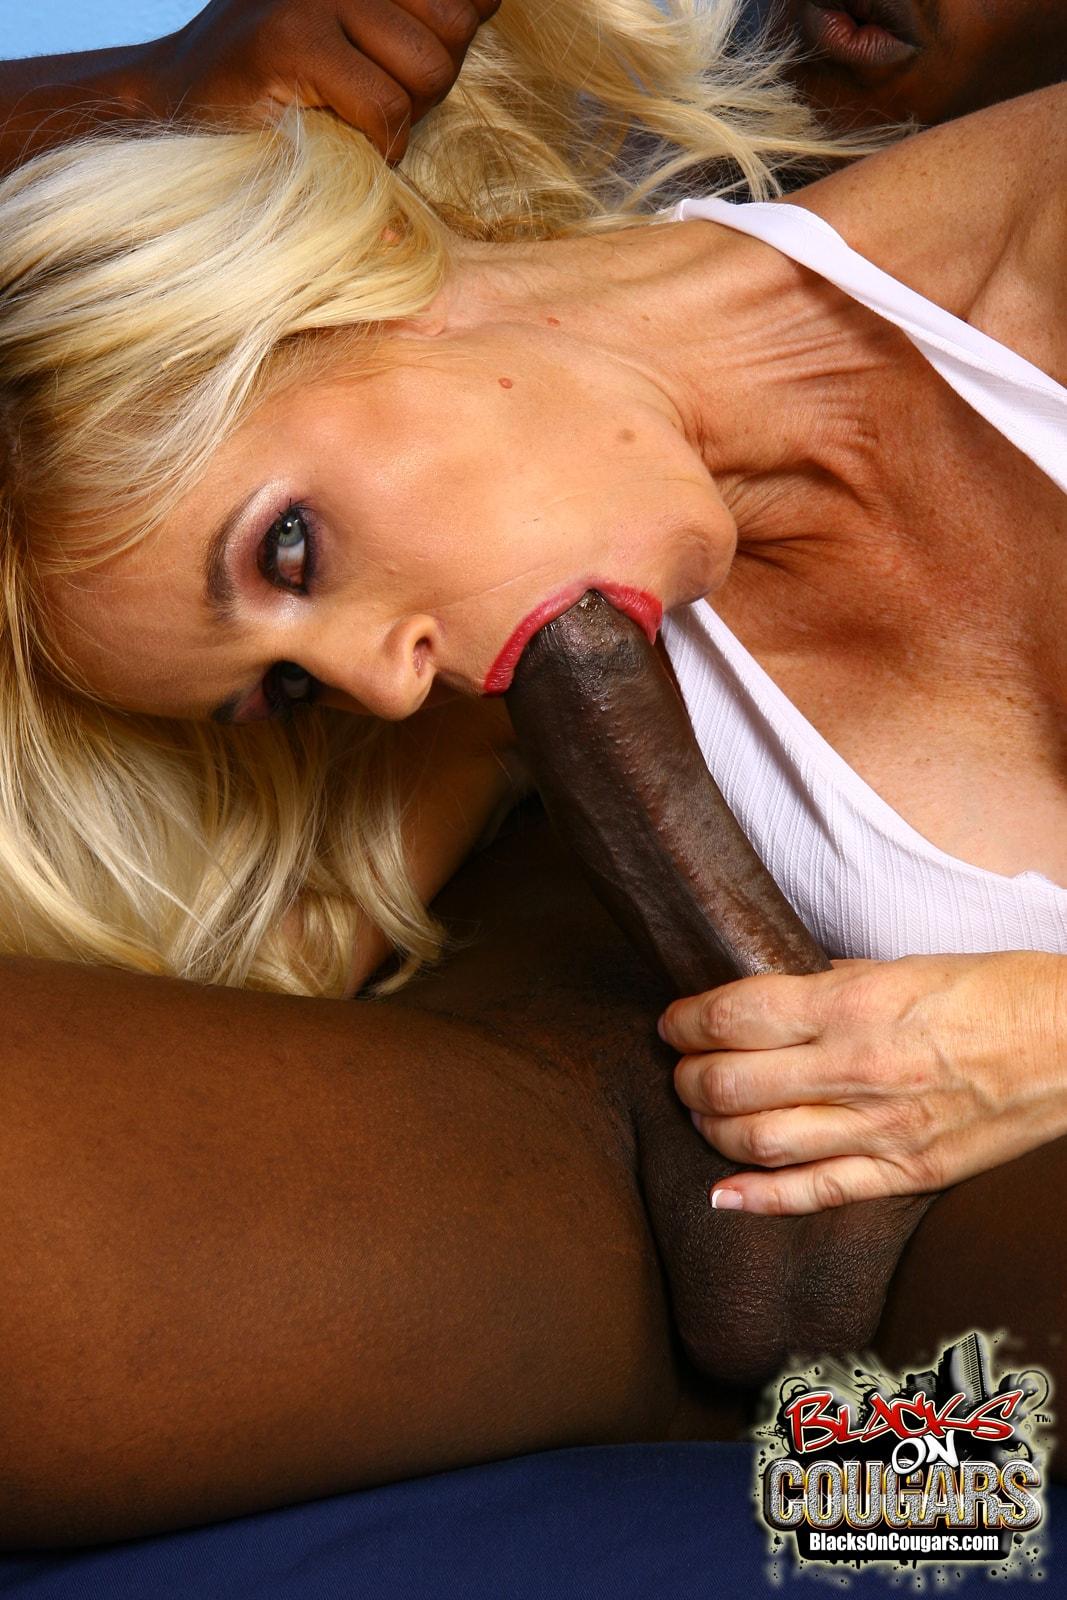 Dogfart '- Blacks On Cougars' starring Tabitha (Photo 15)